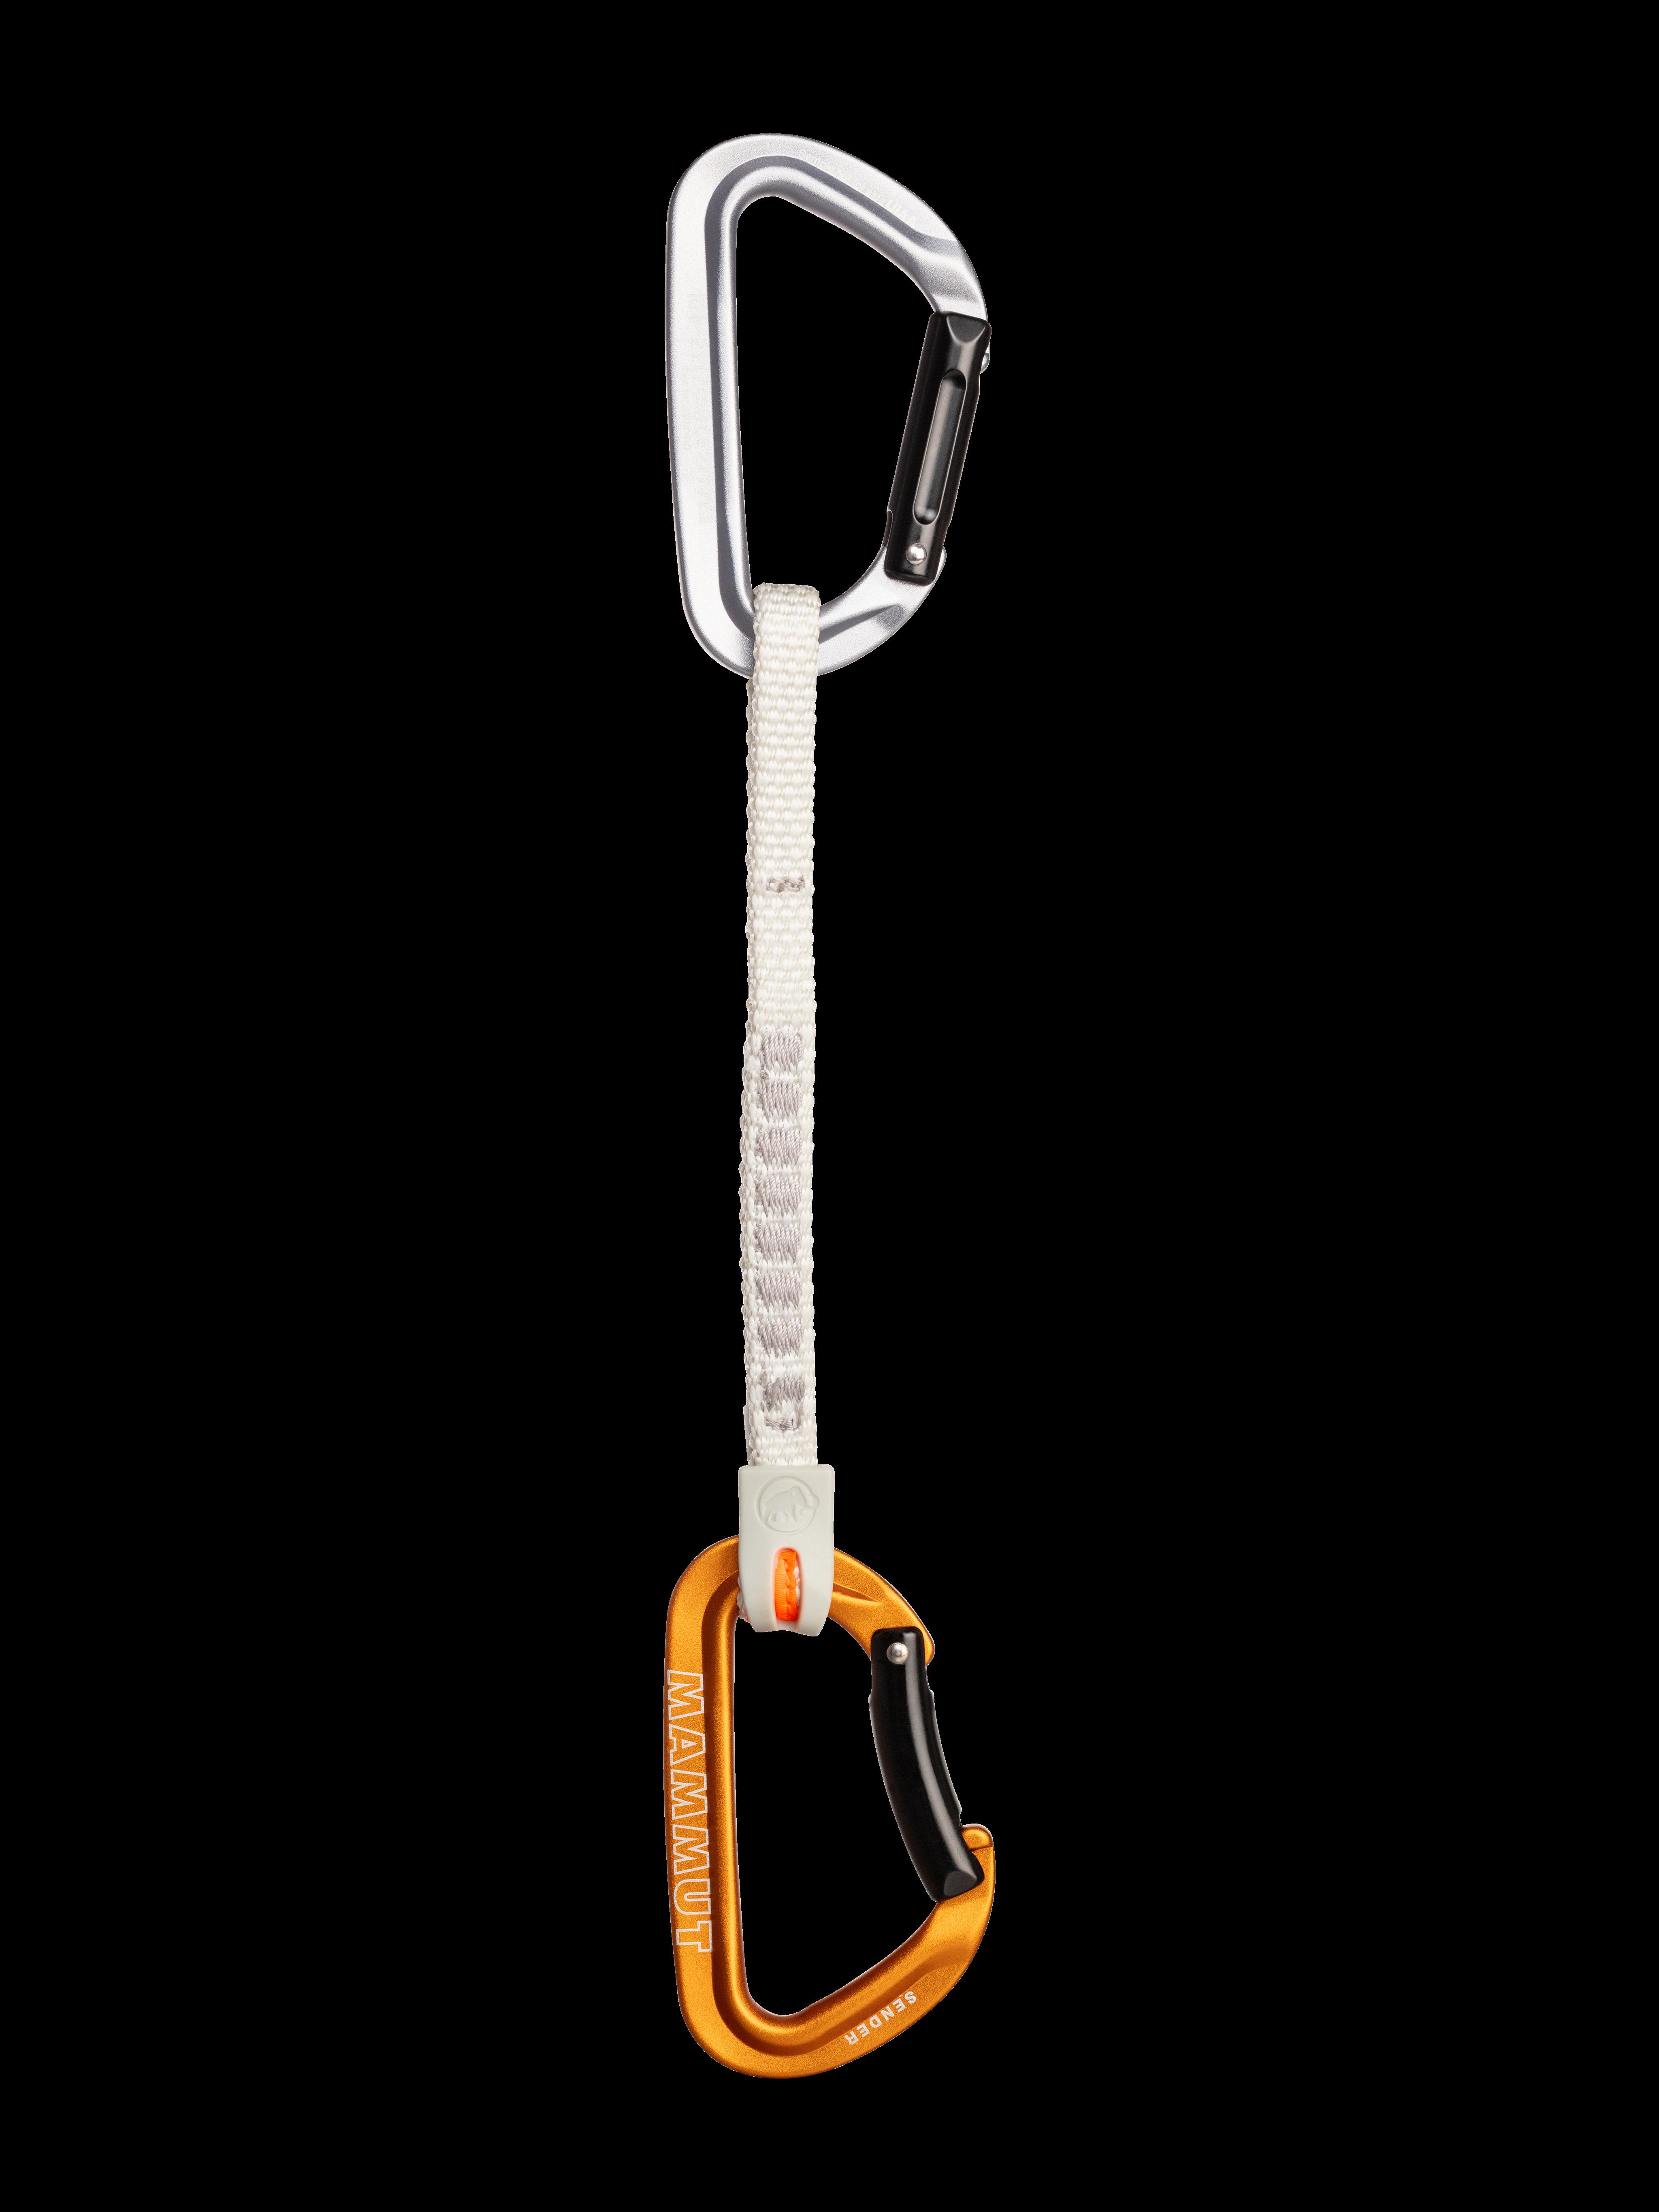 Sender Keylock 17 cm Quickdraw product image